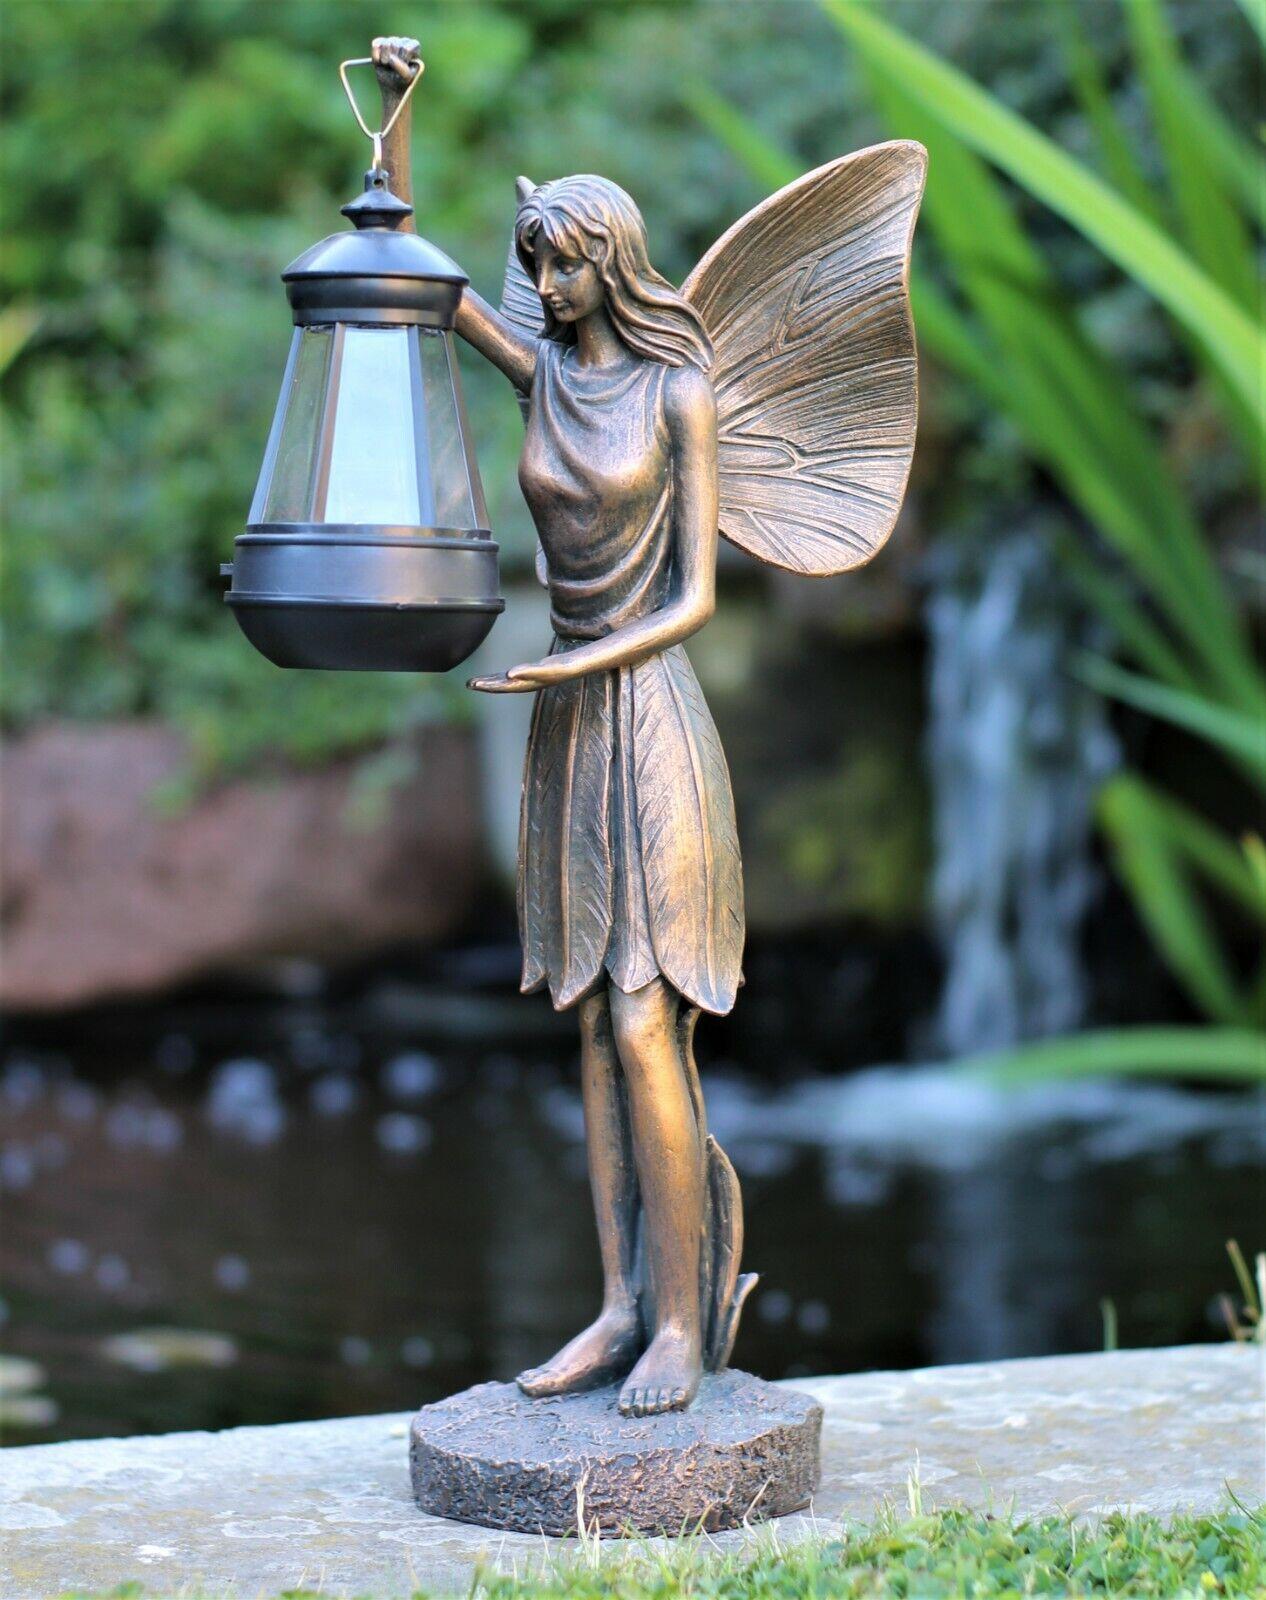 95cm Tall Large Aged Bronze Finish Resin Flower Fairy Garden Statue Ornament